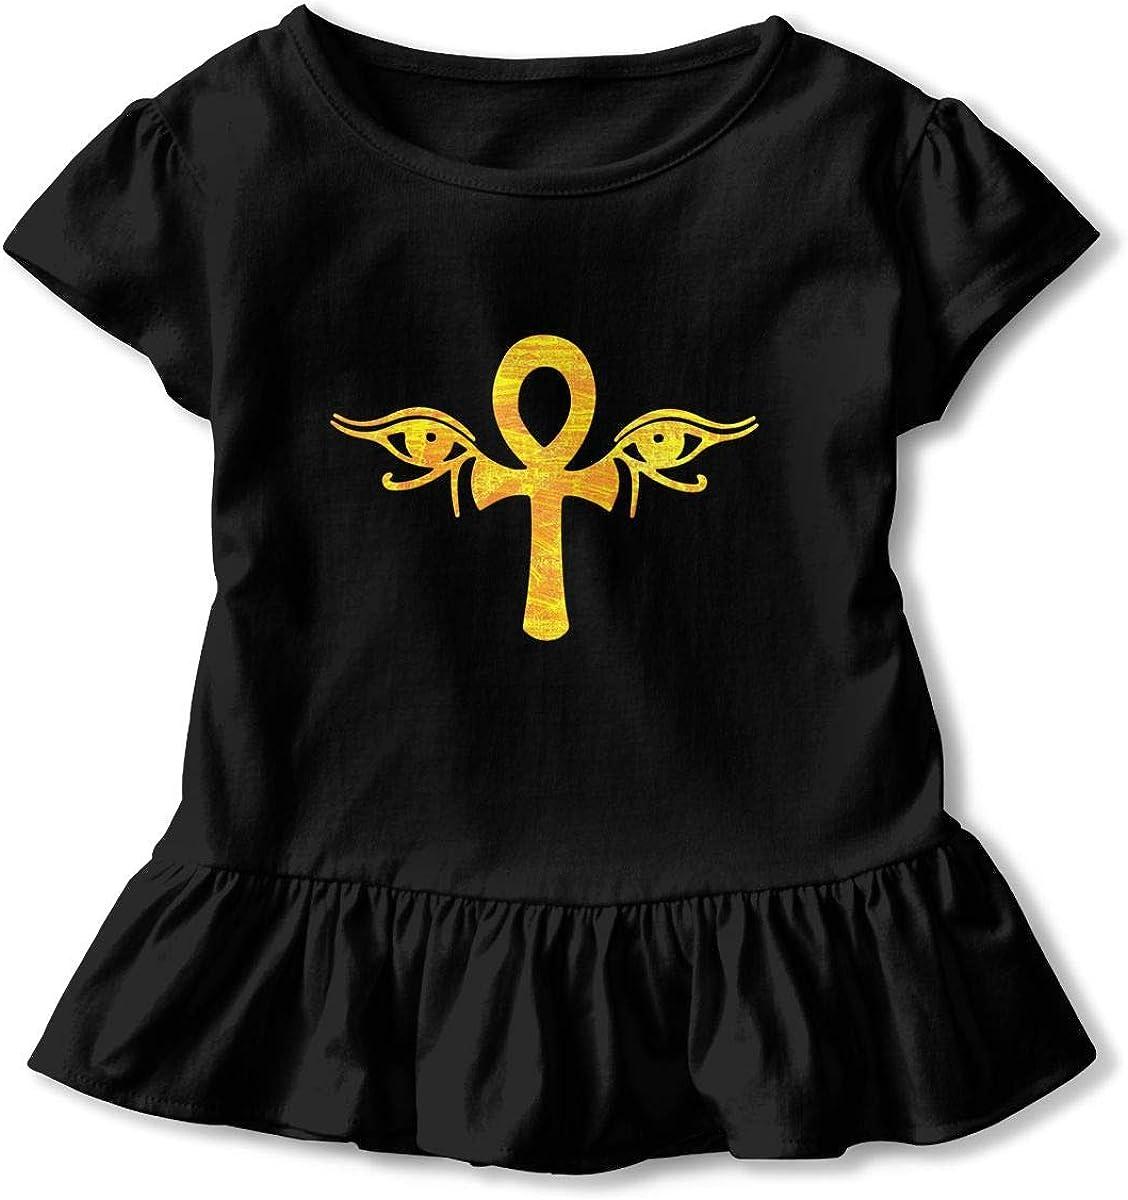 Cheng Jian Bo Ankh Eyes of Horus Egyptian Toddler Girls T Shirt Kids Cotton Short Sleeve Ruffle Tee